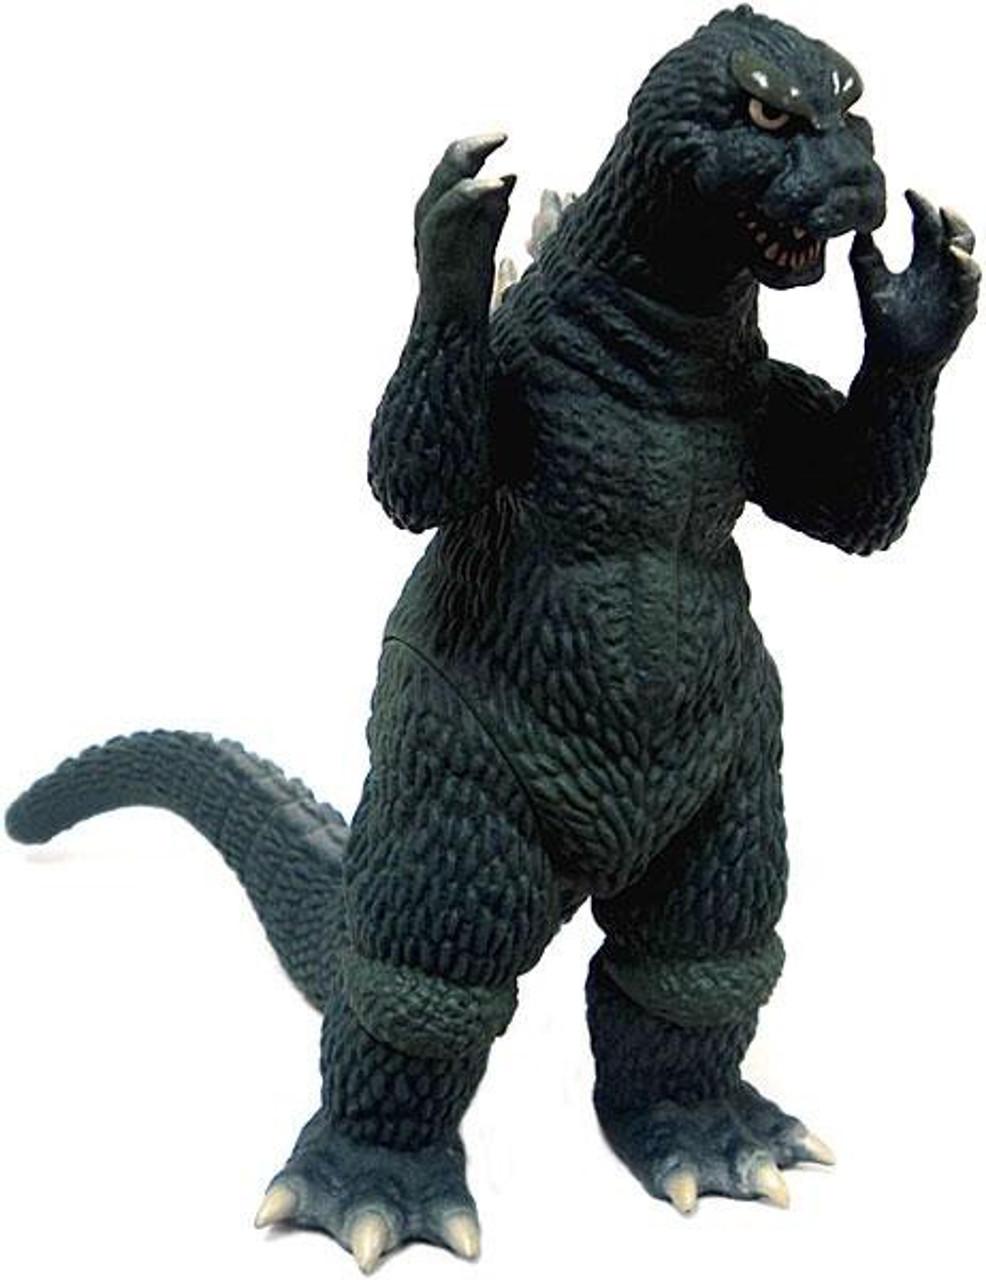 Godzilla 1964 50th Anniversary Memorialbox Godzilla Vinyl Figure ...